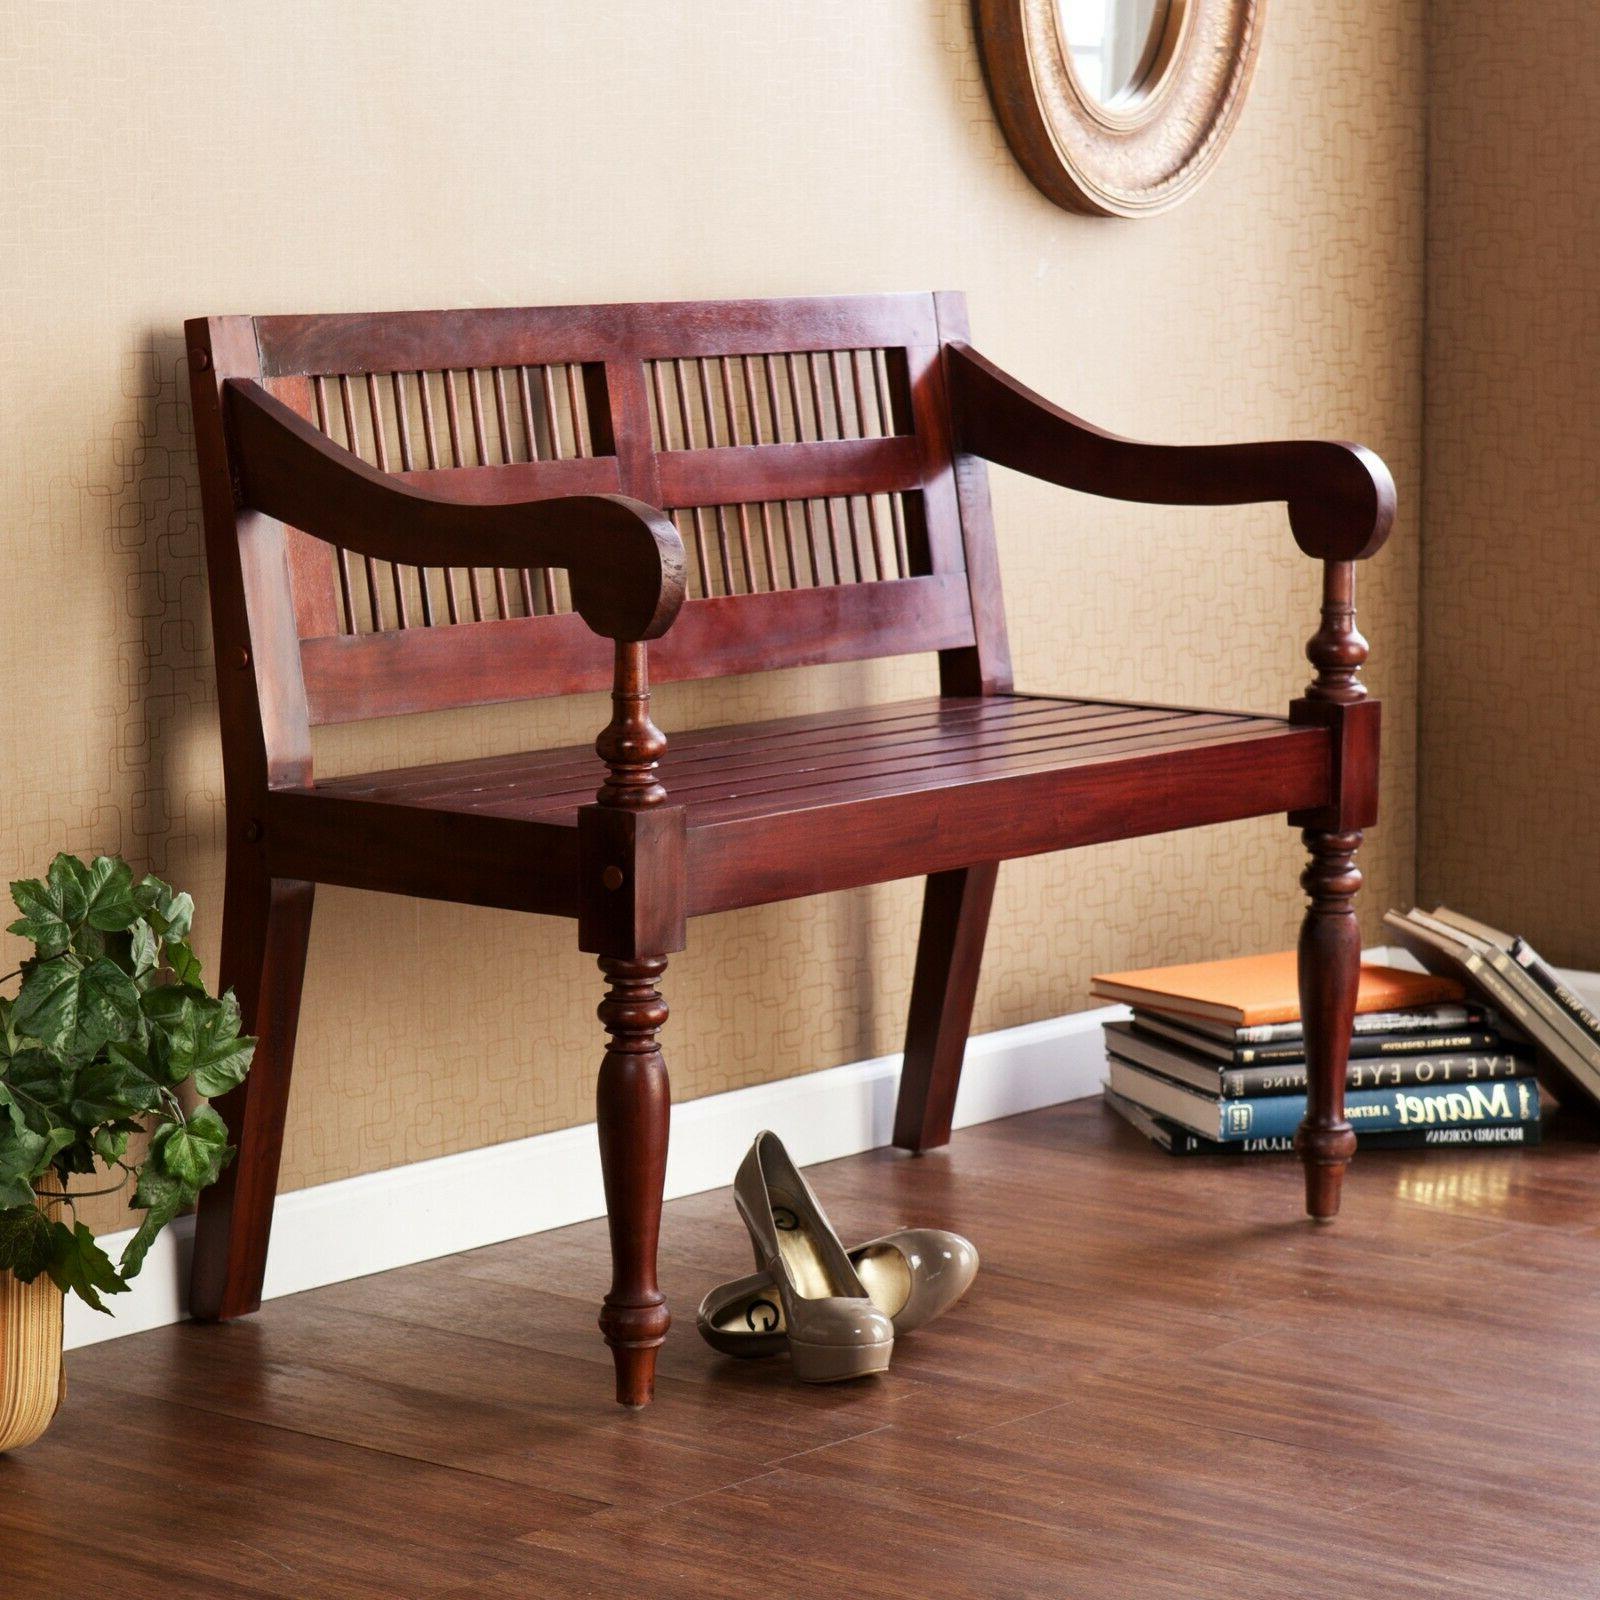 wooden indoor bench mahogany finish wood seat